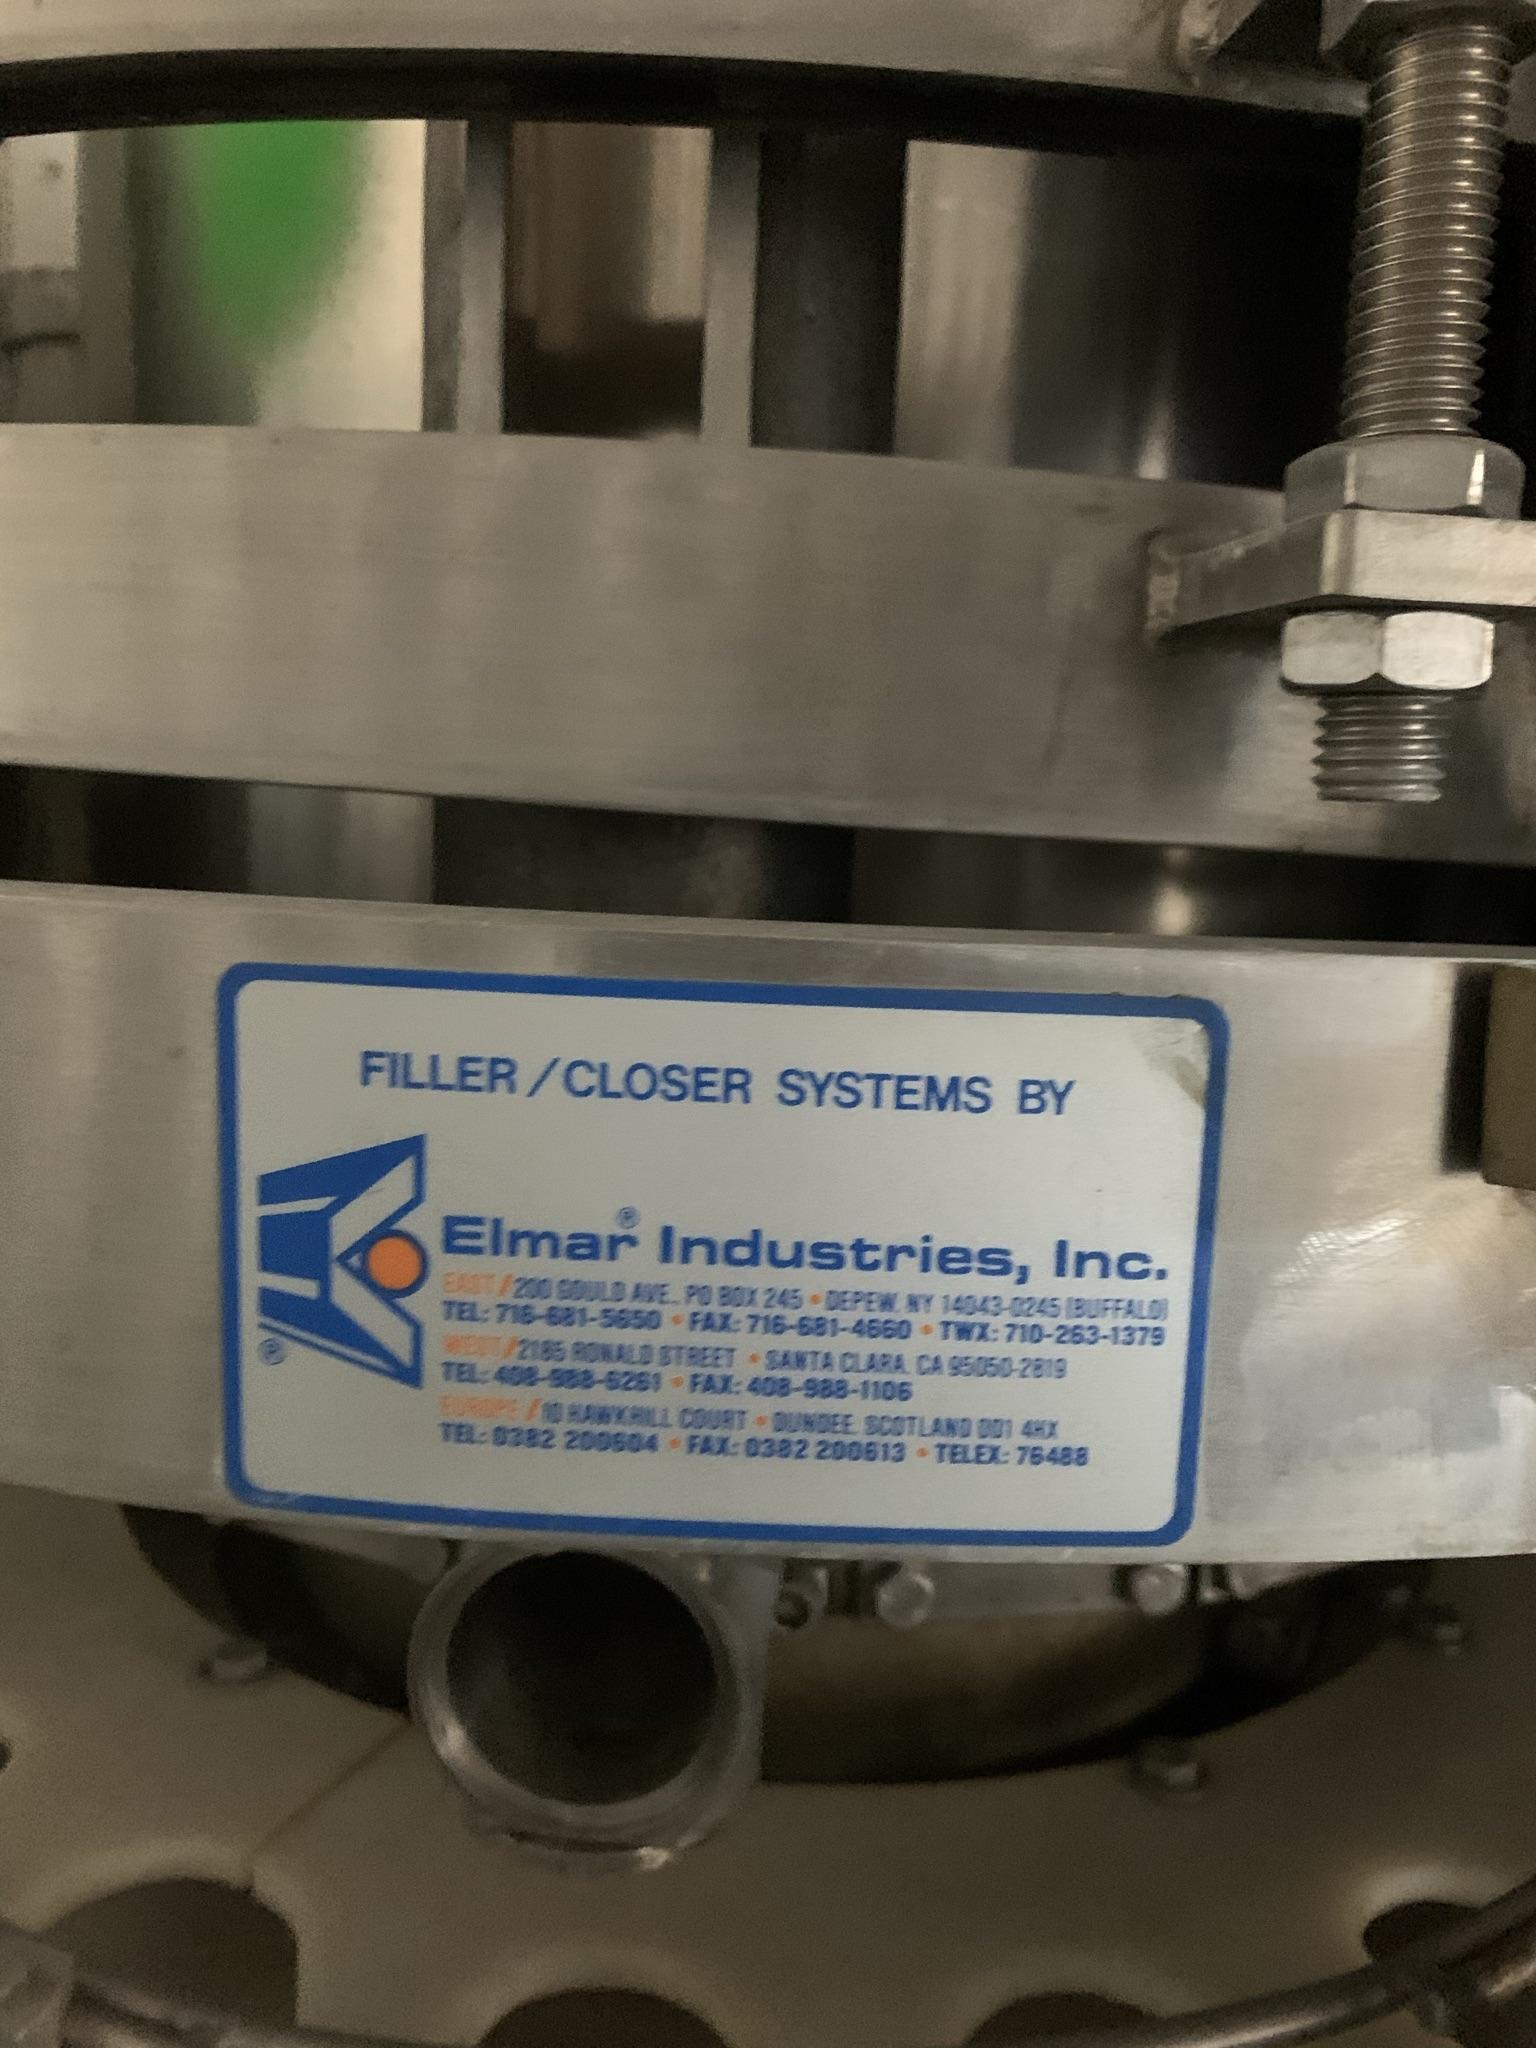 Remplisseuse empoteuse doseuse capeuse Elmar Industries